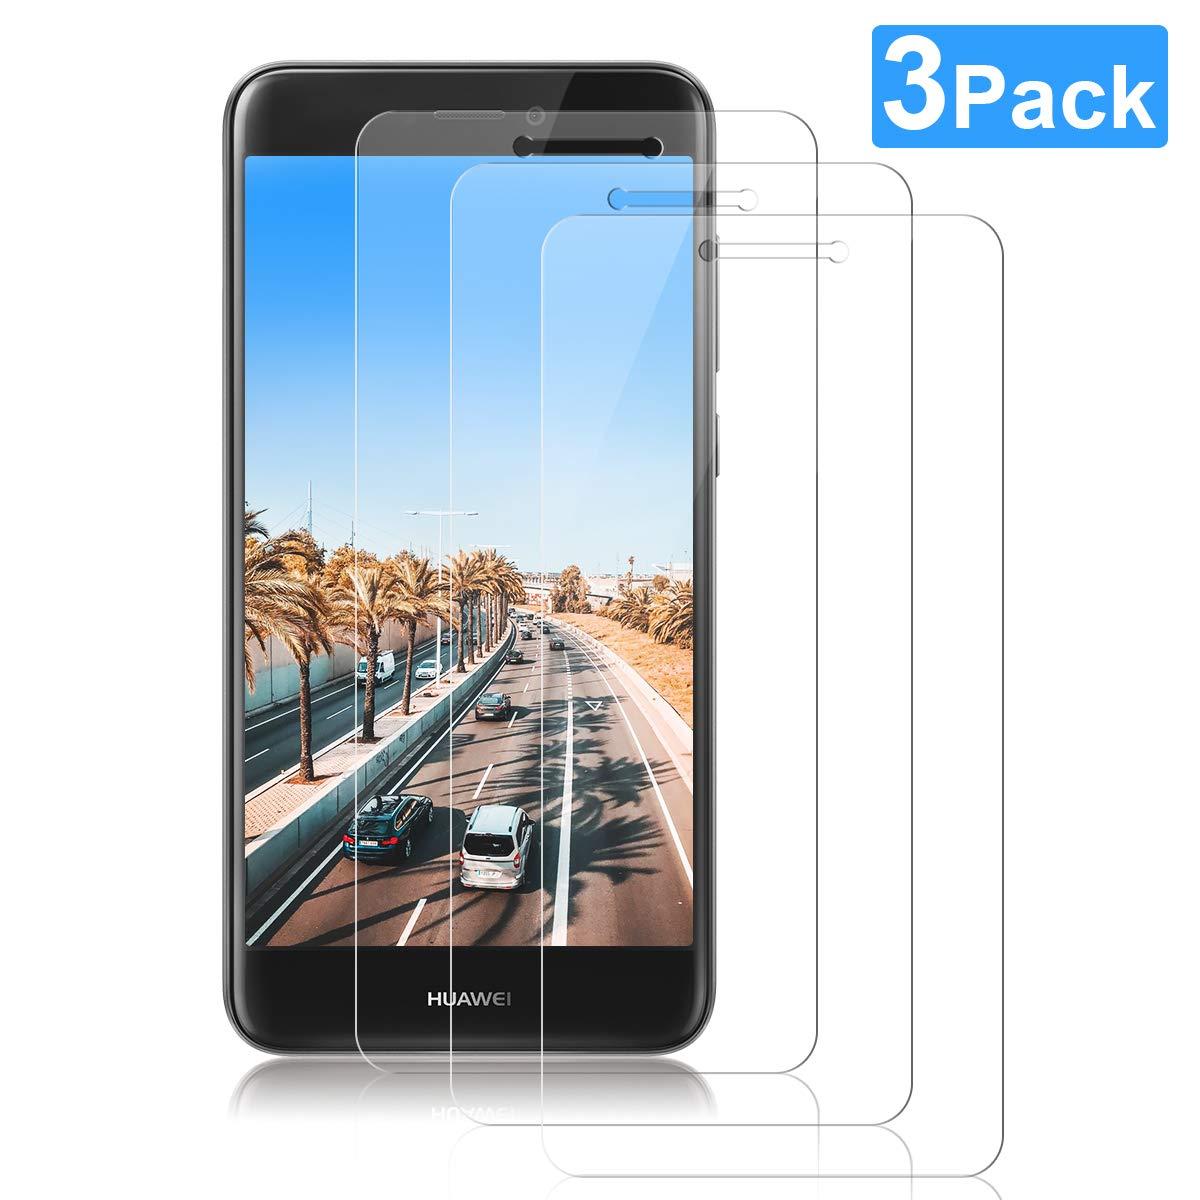 NONZERS Cristal Templado para Huawei P8 Lite 2017,Protector de Pantalla para P8 Lite 2017,Alta Definicion,Resistente a Arañazos y Golpes,3 Unidade